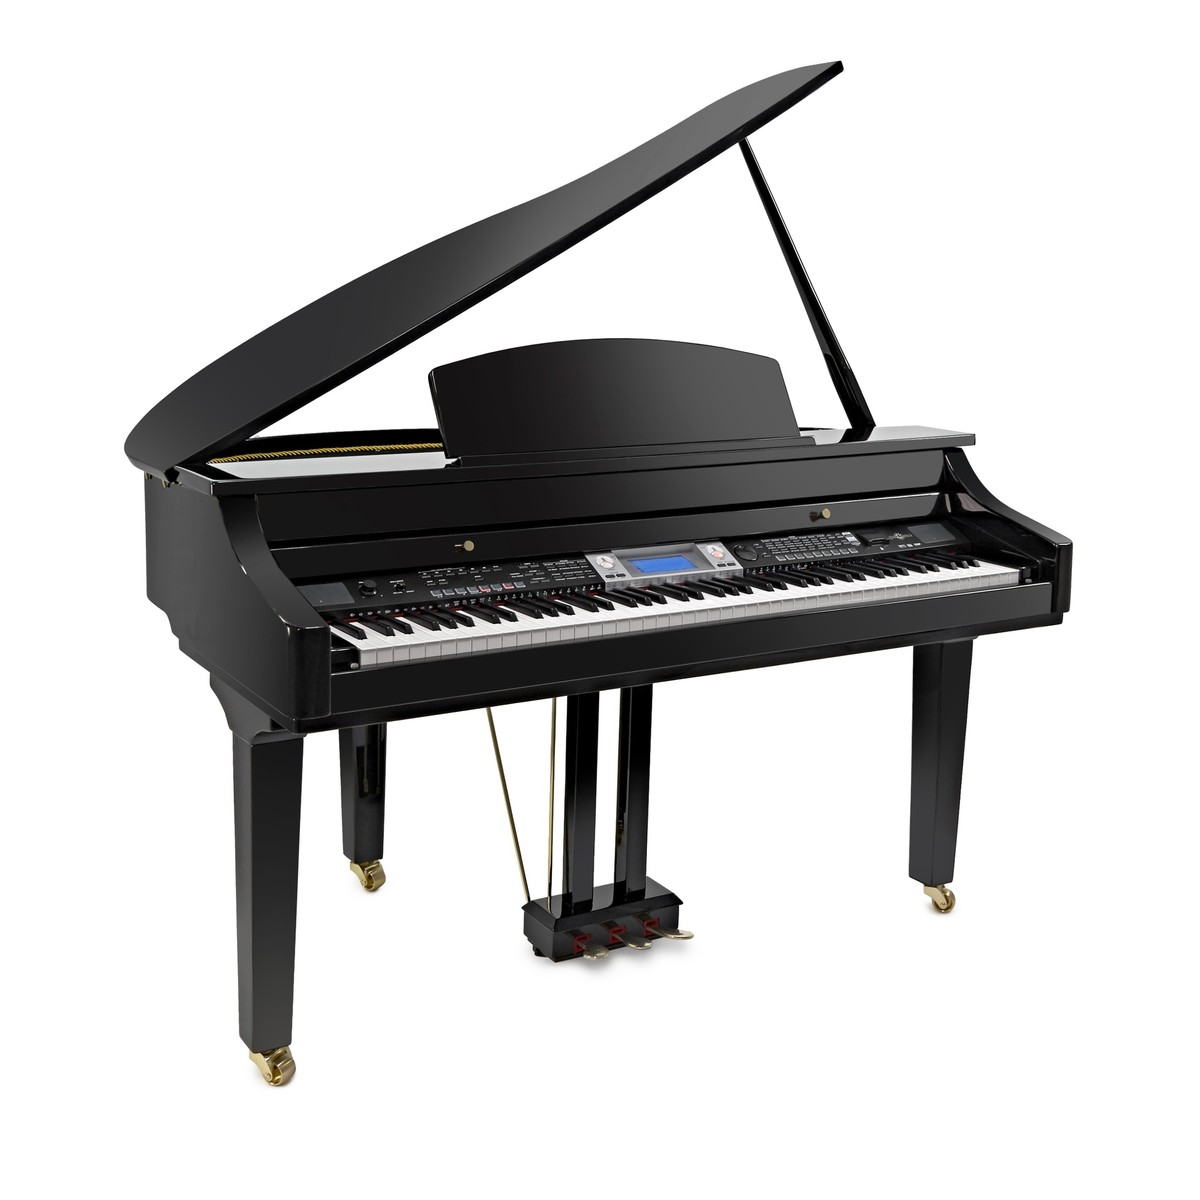 gear4music pianoforte digitale  GDP-300 Pianoforte Digitale a Coda di Gear4music | Gear4music